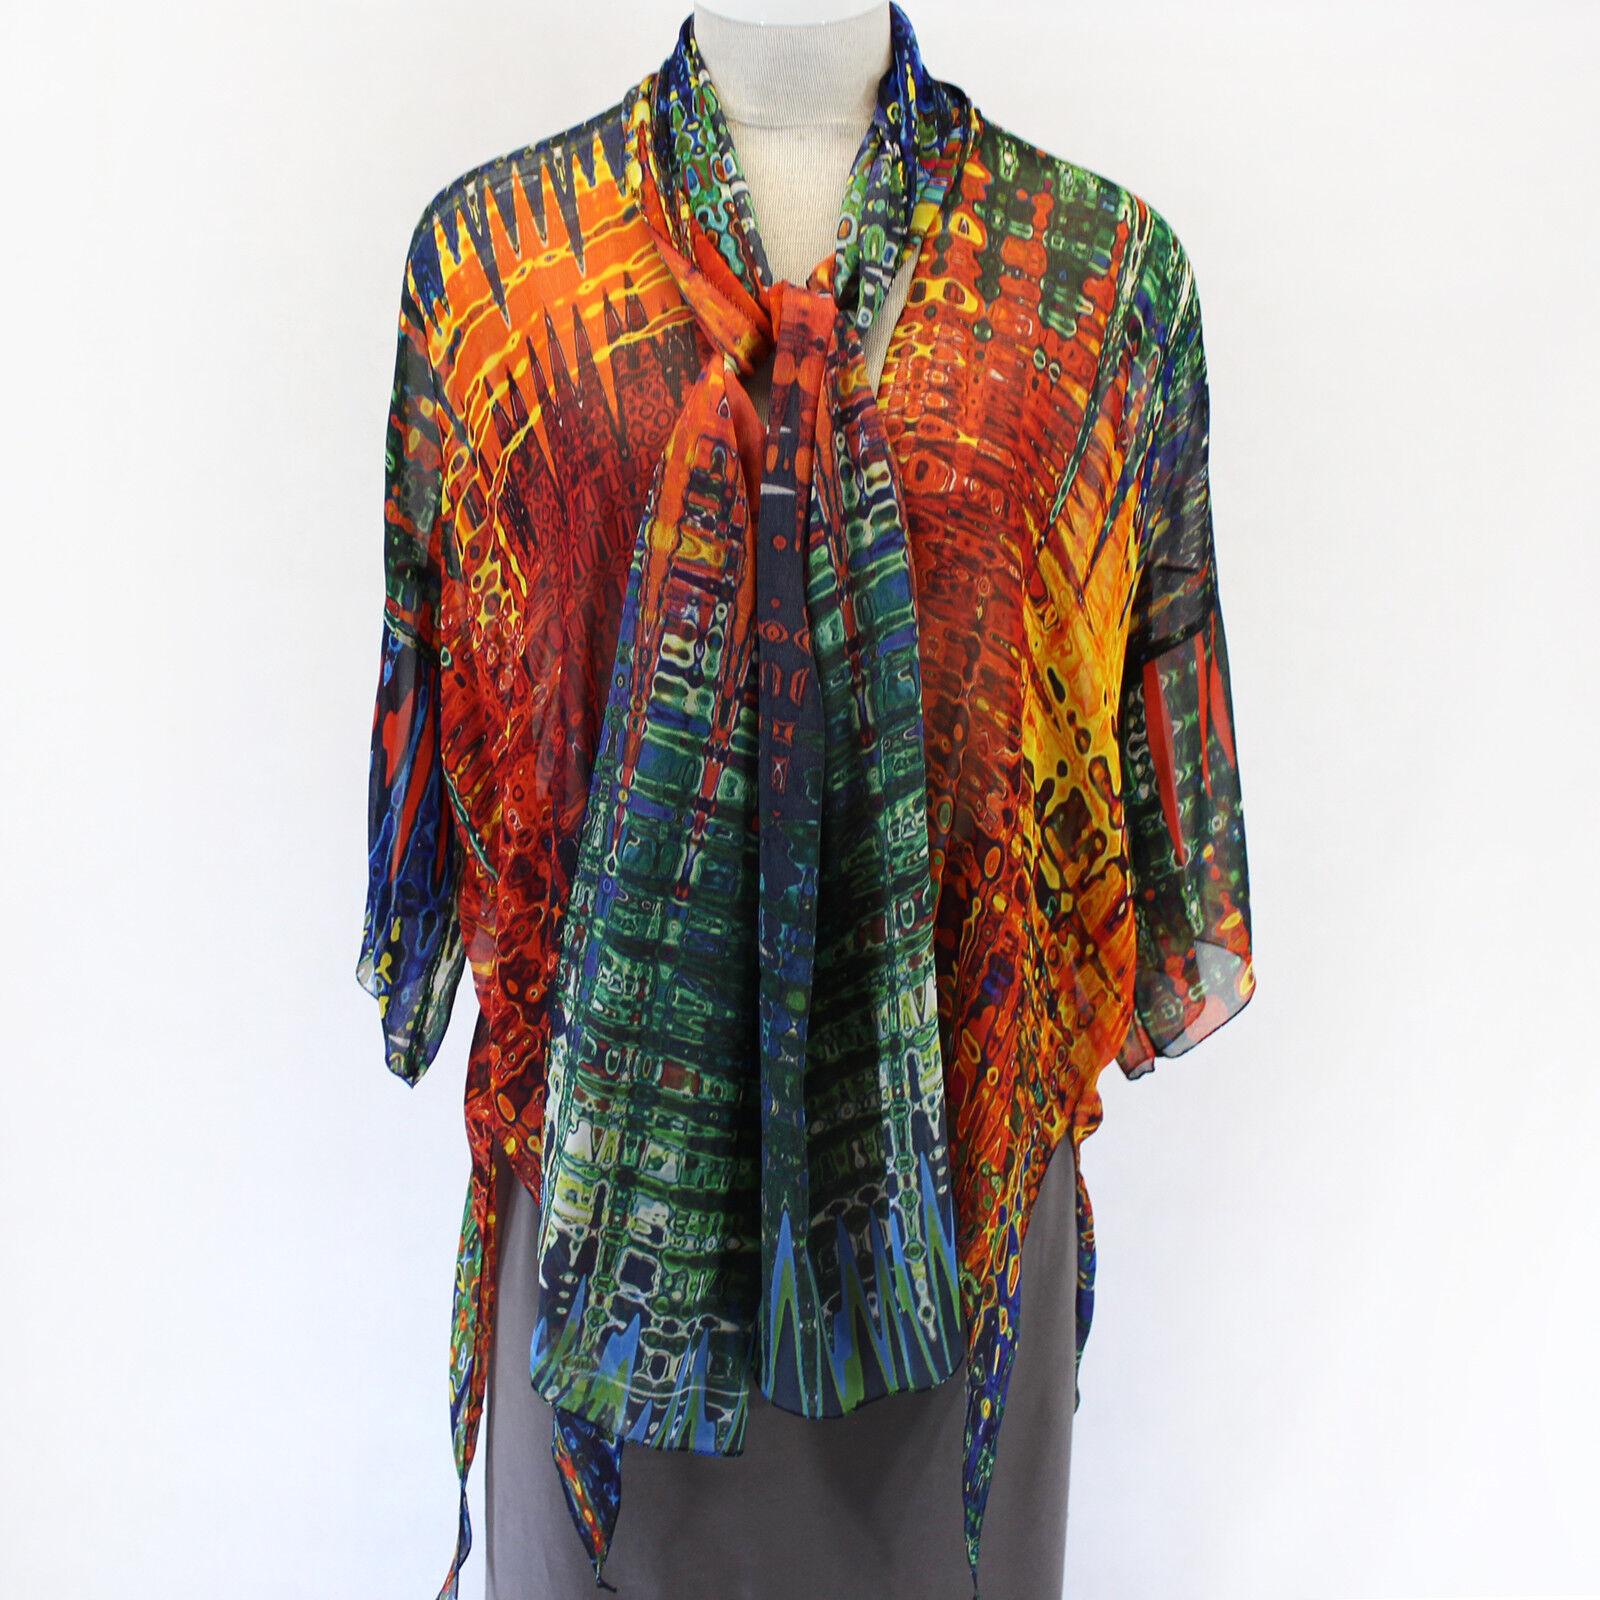 NEW Dilemma Plus Rauchenberg Inspirot 100% Silk Jacket & Scarf OS fits XL 1X 2X